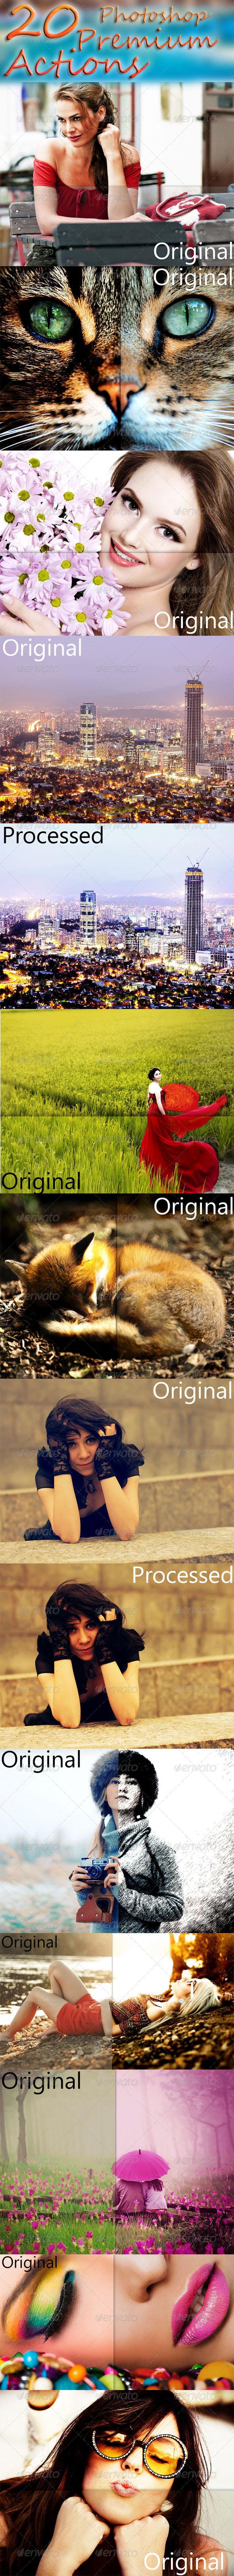 GraphicRiver 20 Premium Photoshop Actions 7091725